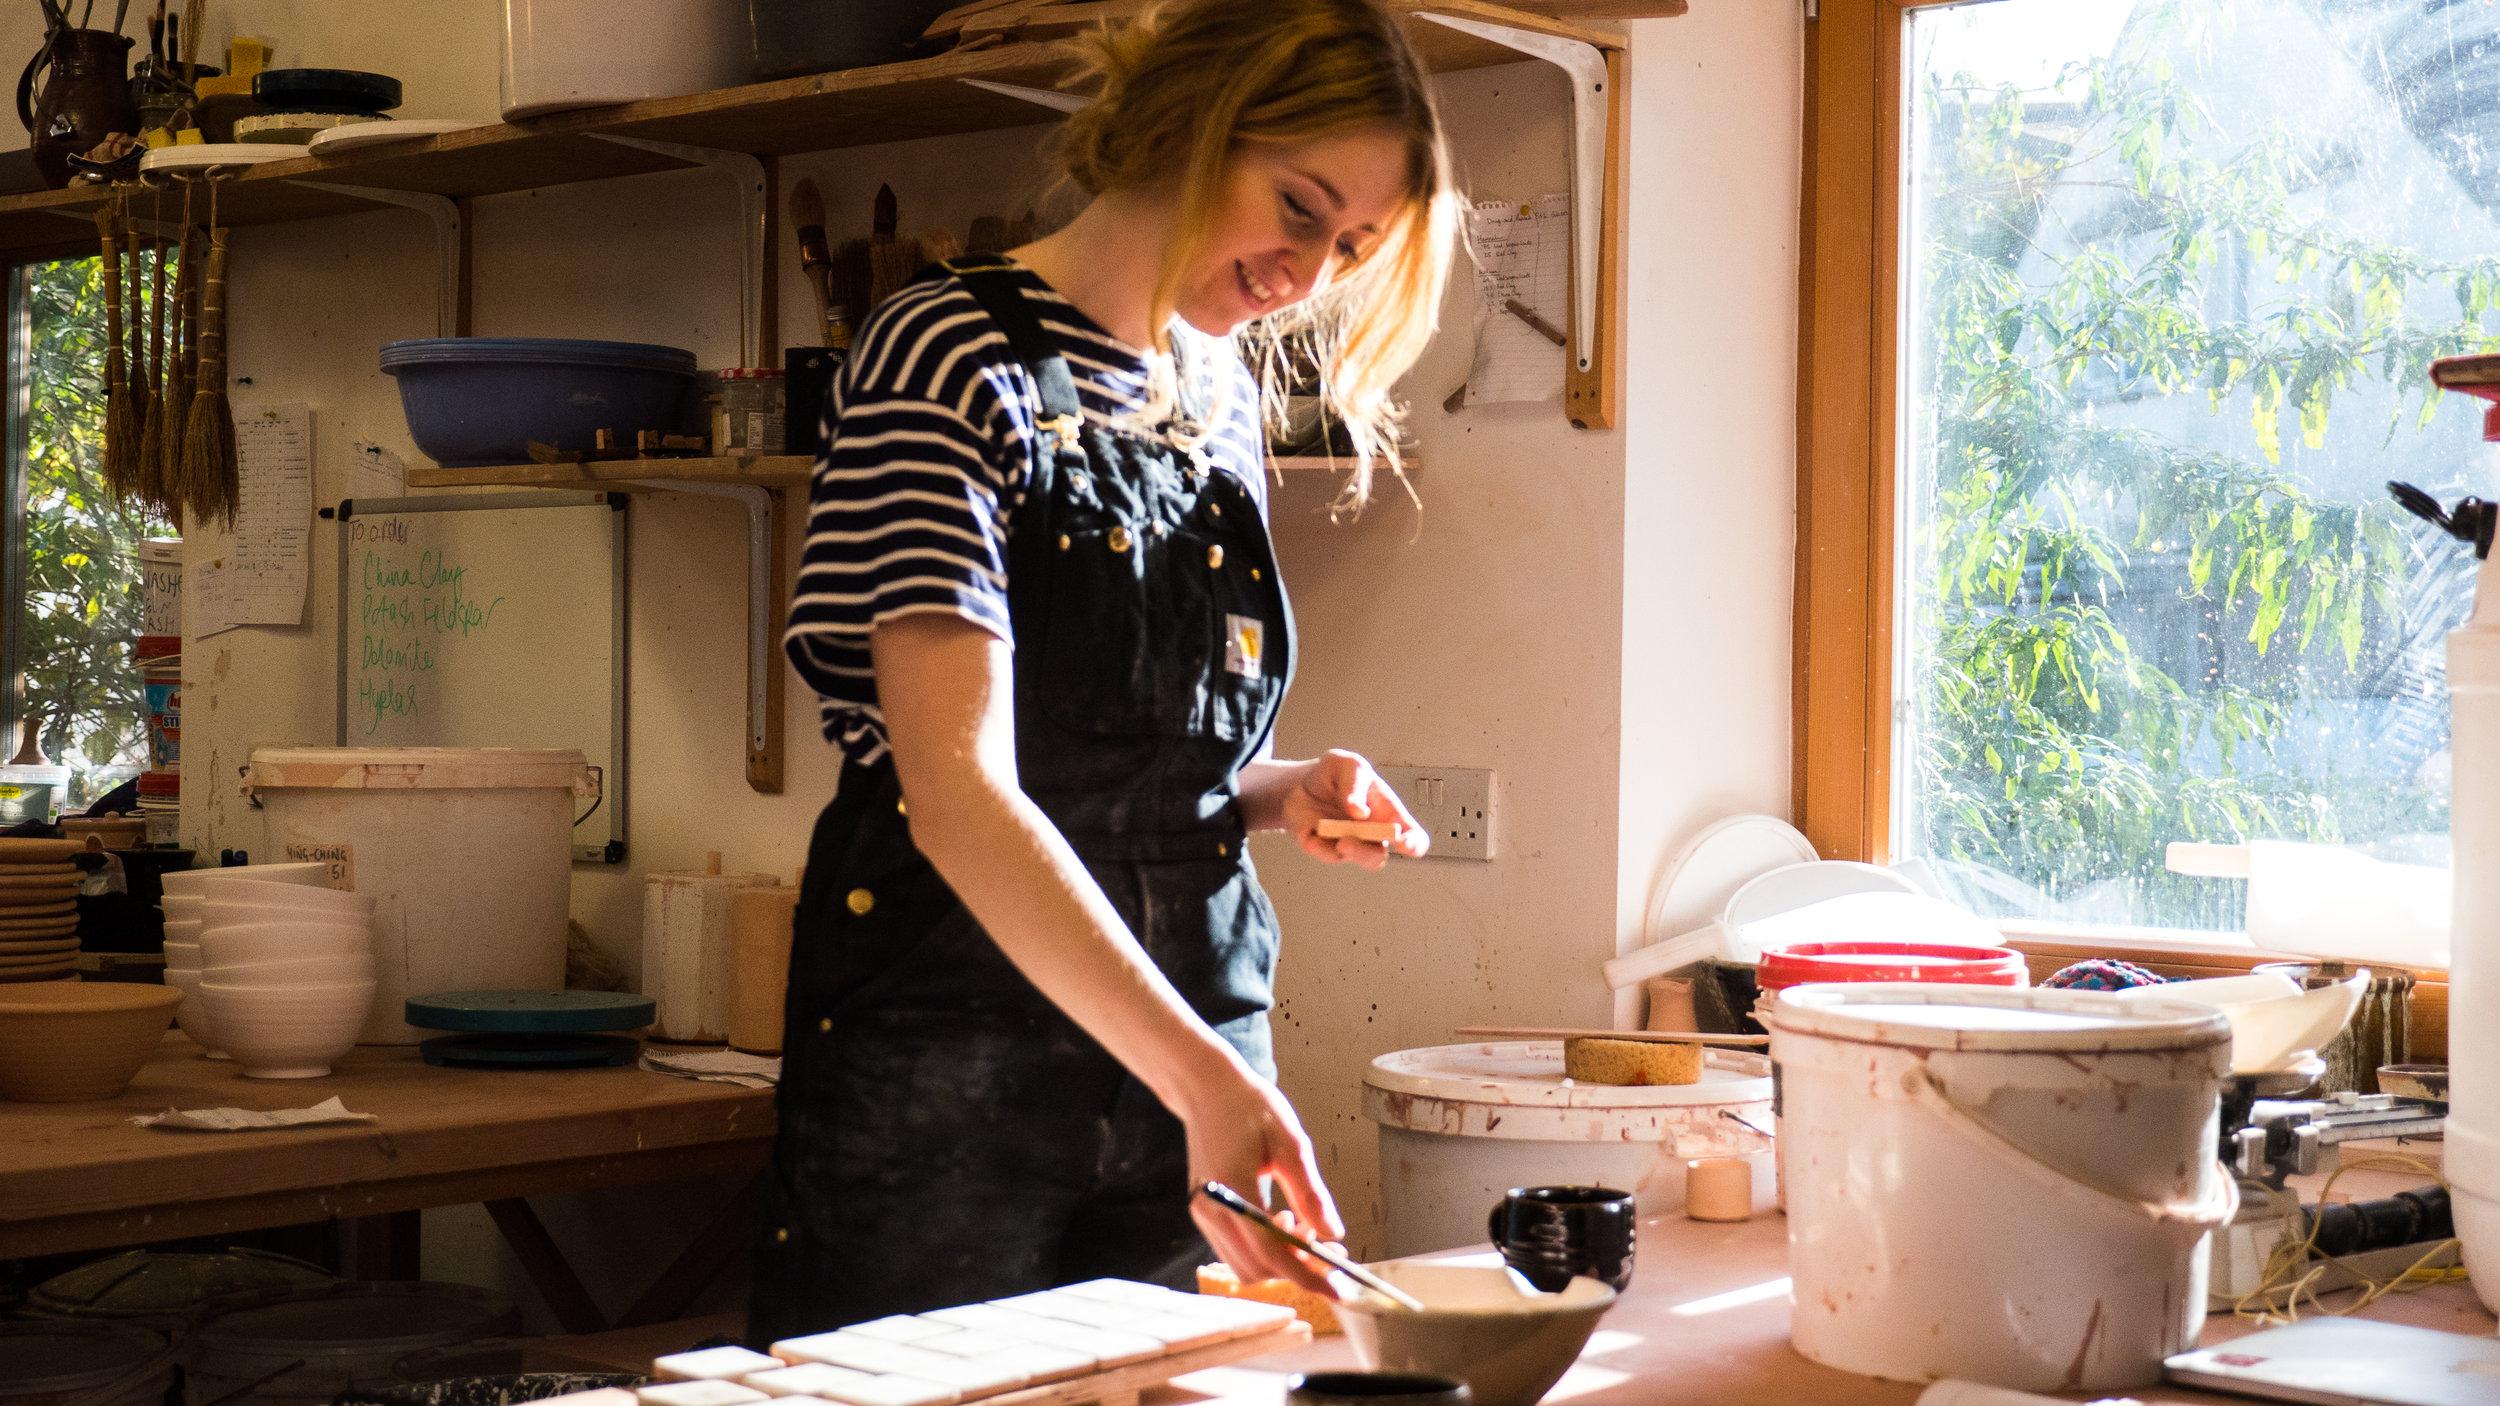 Shannon Bartlett-Smith. Photo by Charley Gaidoni.